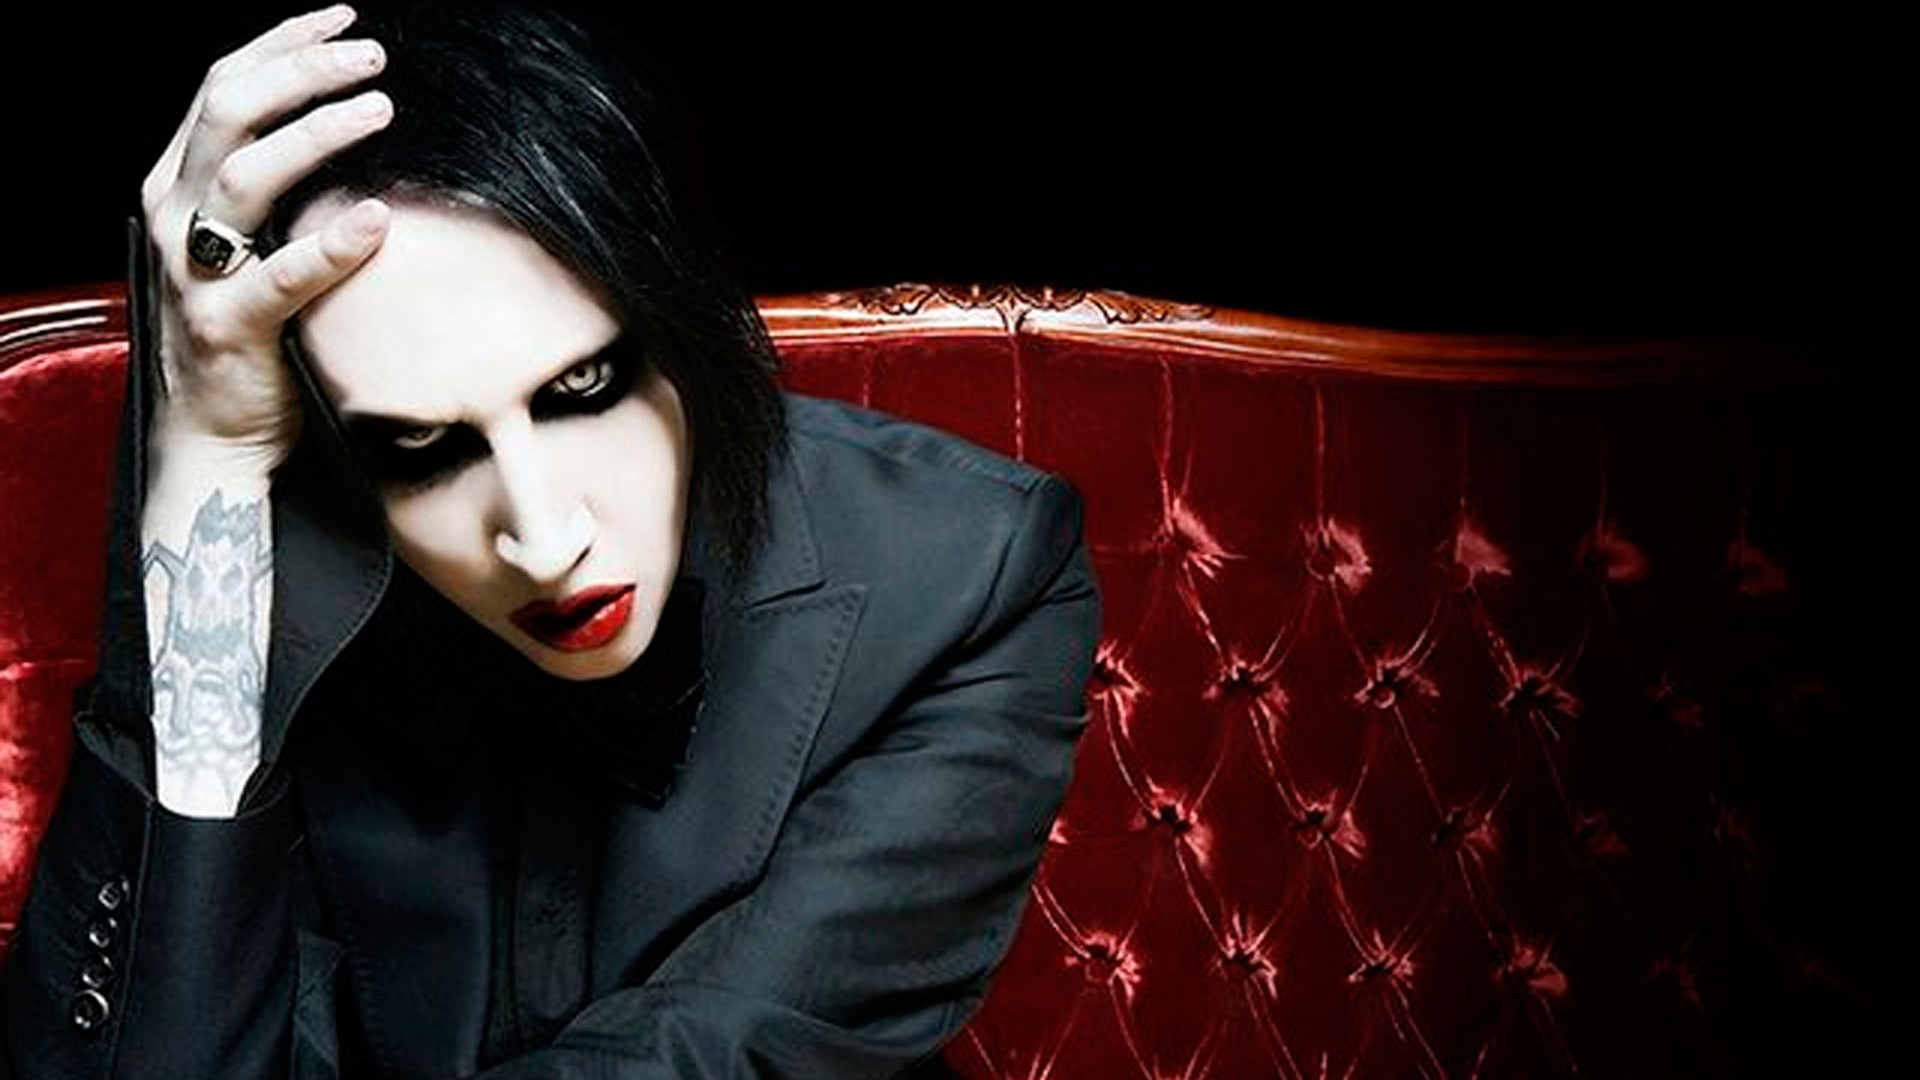 Marilyn Manson Wallpaper Hd 65 Images